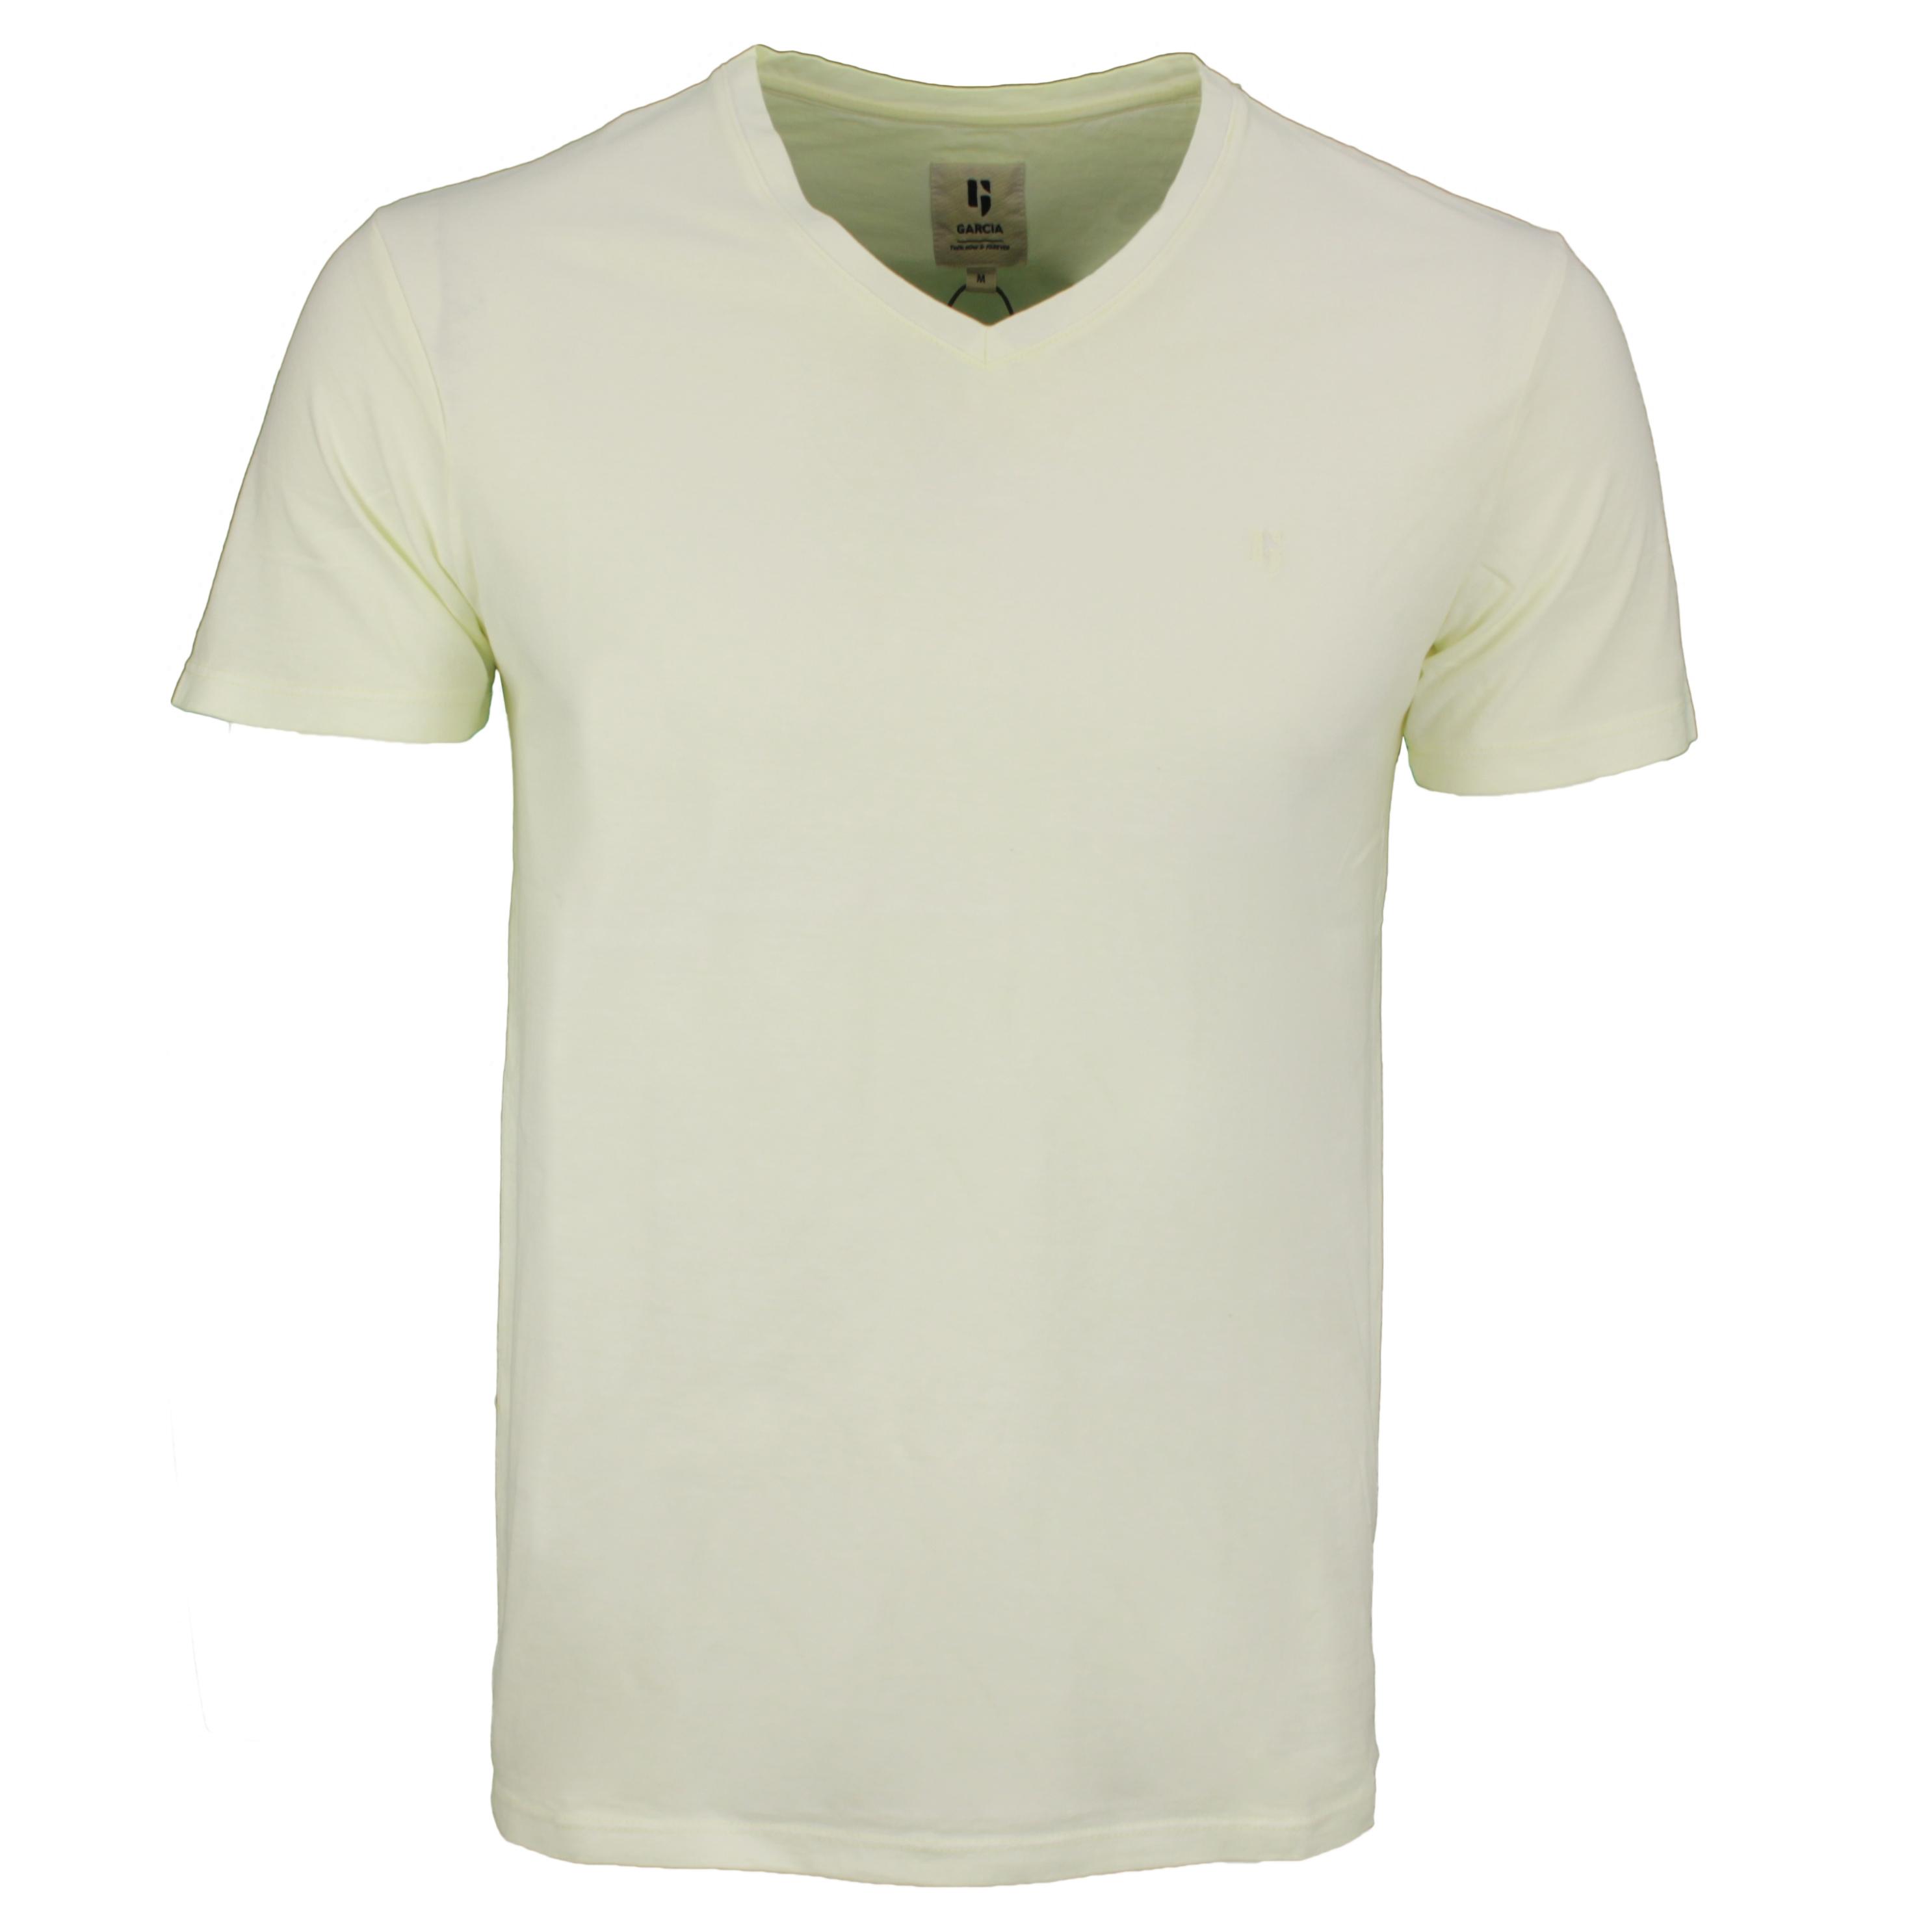 Garcia Herren T-Shirt Shirt kurzarm gelb Used Look E11020 7513 neon lime